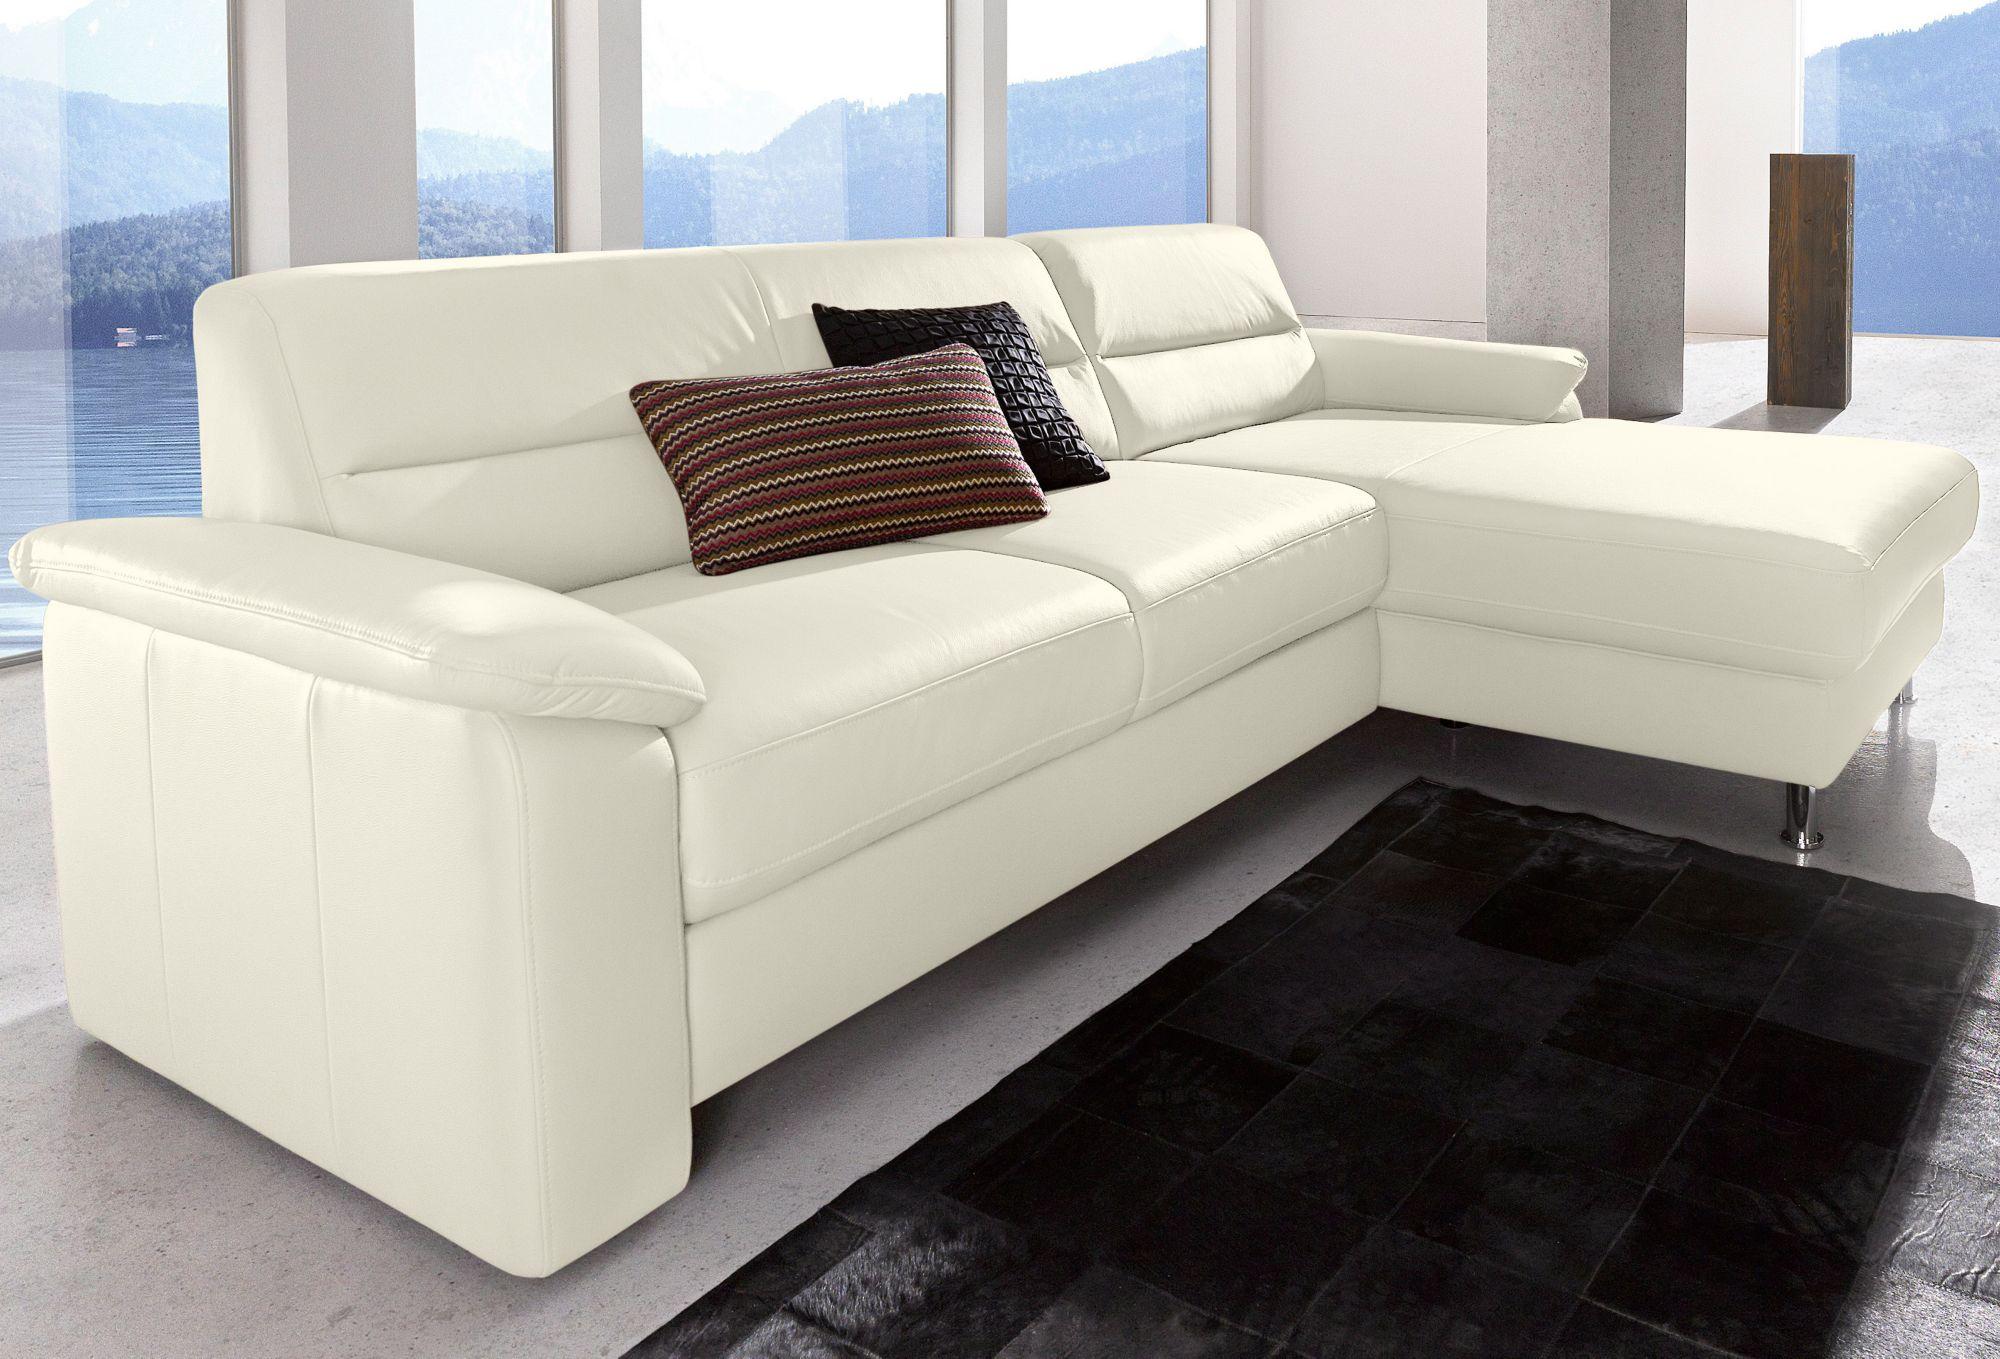 polsterecke sit more inklusive boxspring polsterung schwab versand leder ecksofas. Black Bedroom Furniture Sets. Home Design Ideas